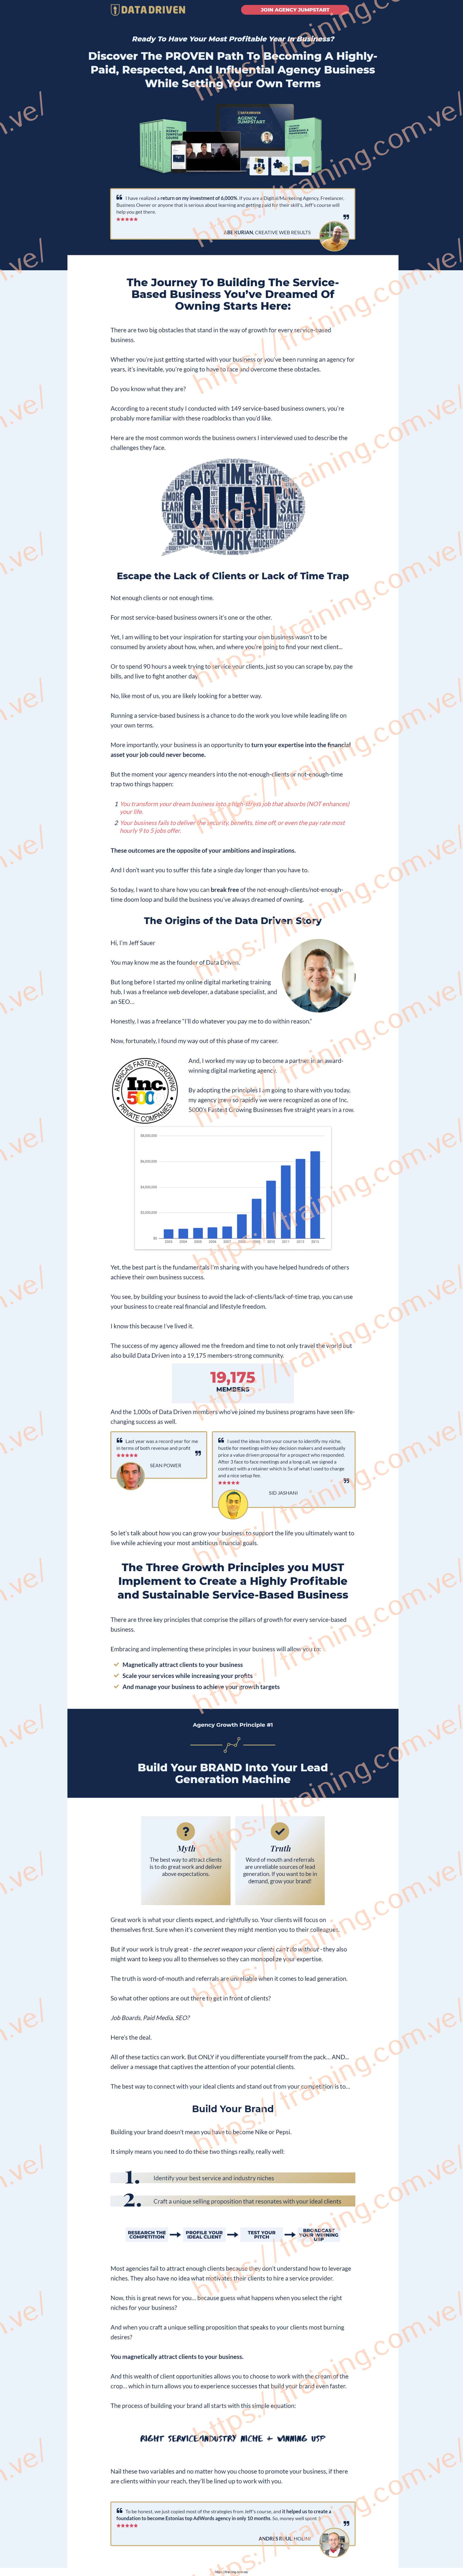 Agency Jumpstart by datadrivenu (Incldes Sales Jumpstart) Sale Page